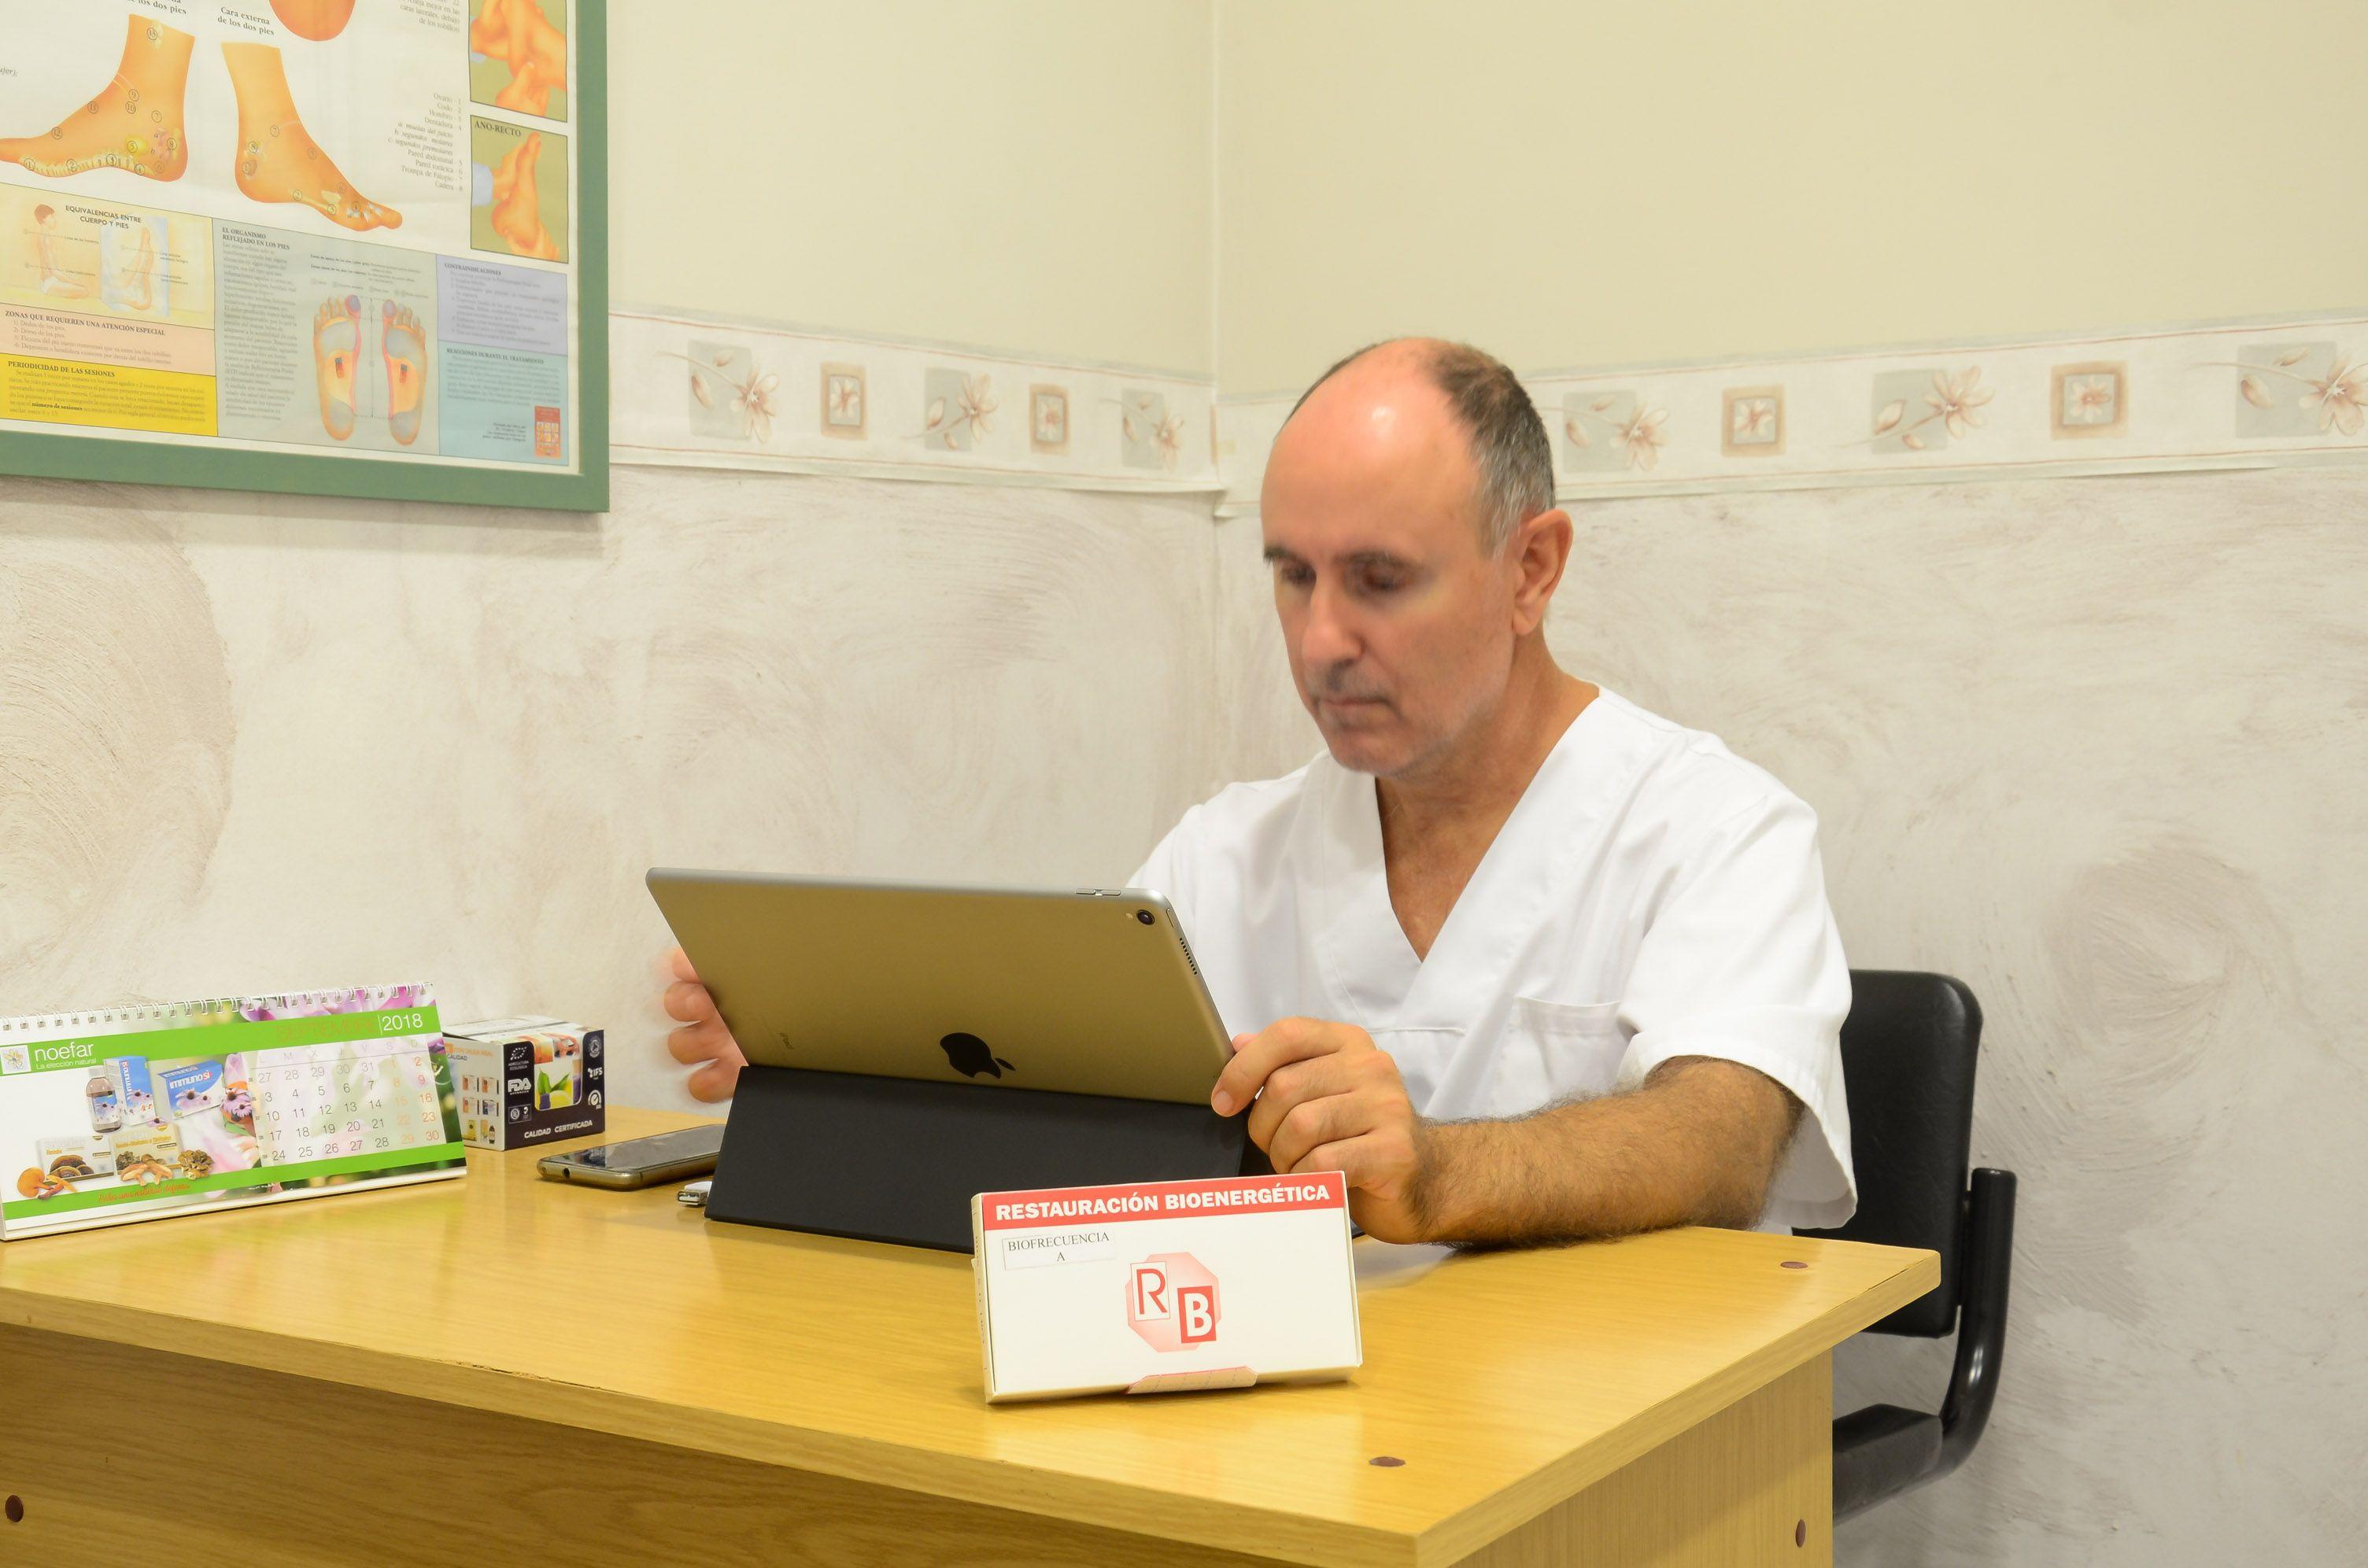 Profesional Tomás Acupuntura Energy